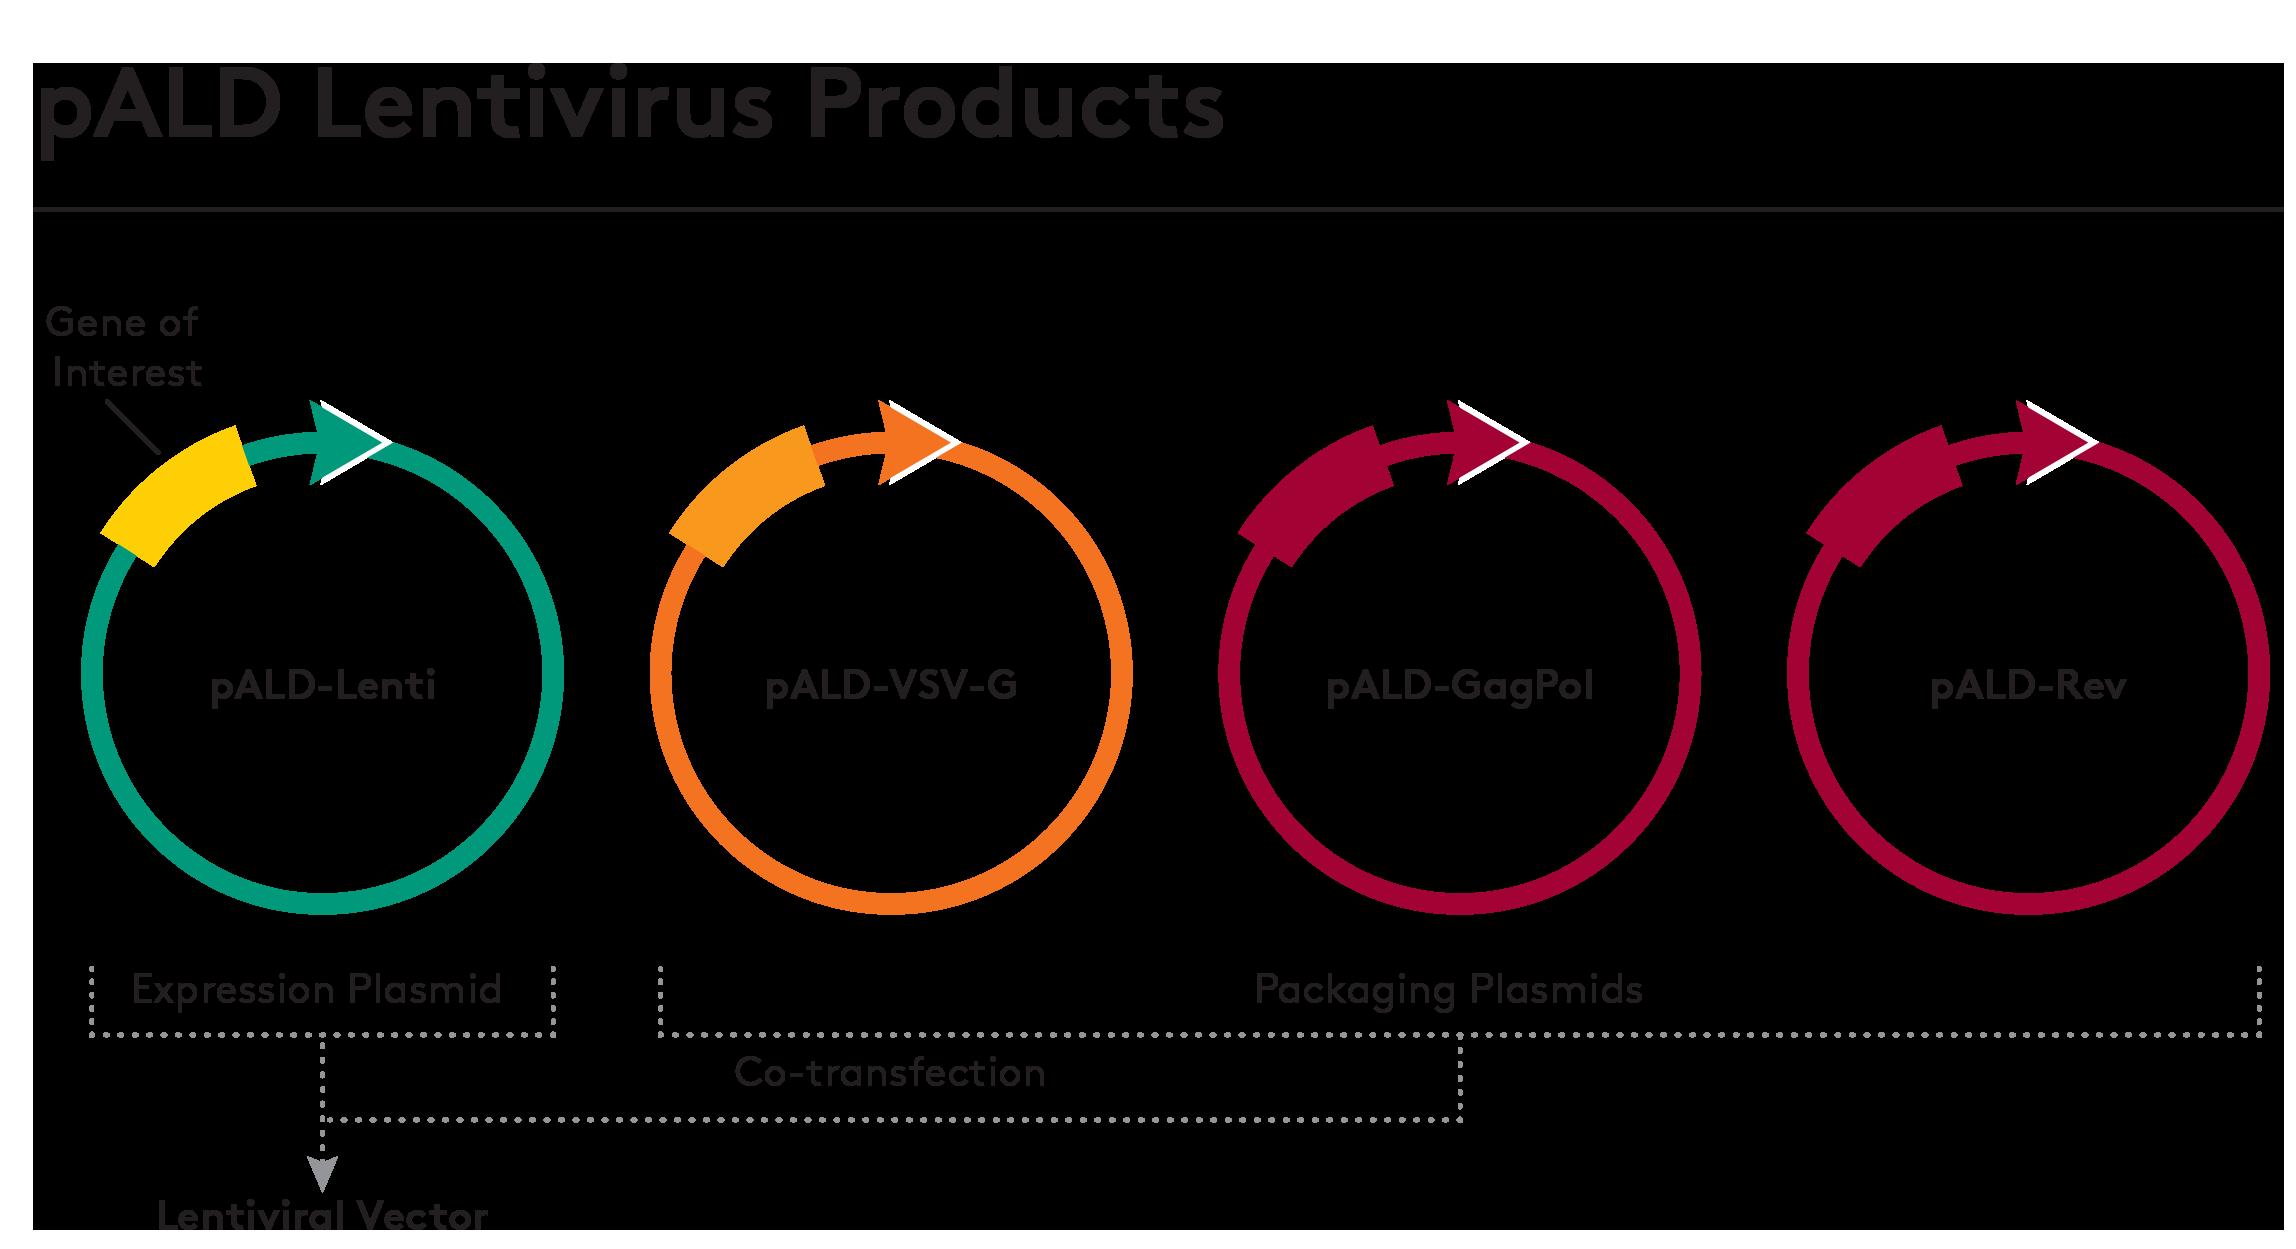 pALD-Lentivirus-Products graphic